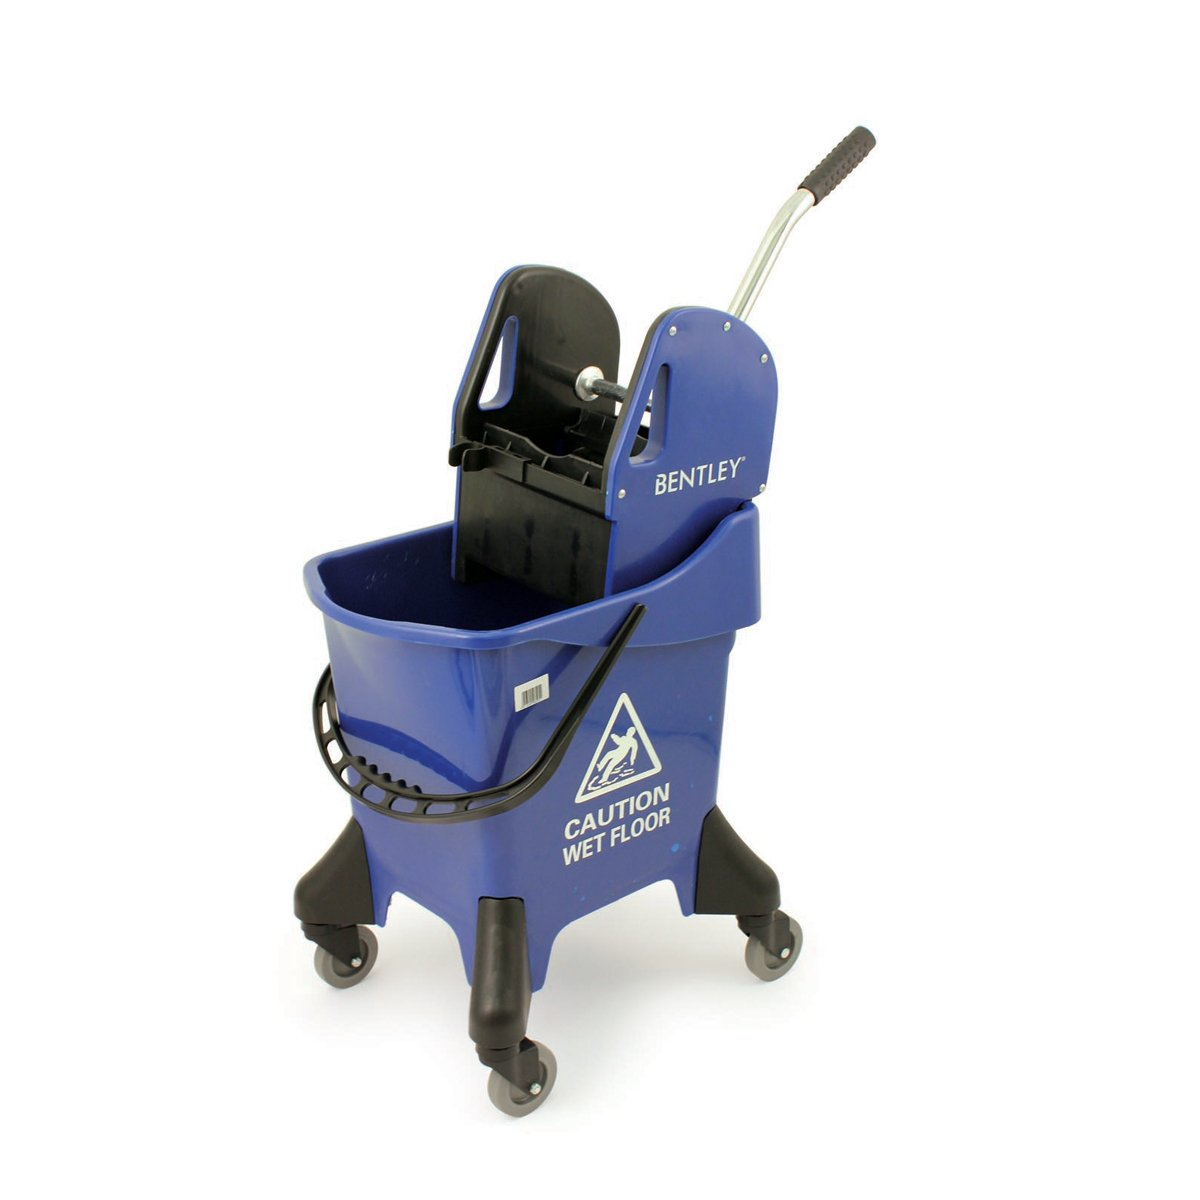 Bentley industriale HR/MB.31/B Ergo mop Bucket Combo, capacità : 31 l, blu capacità: 31l Charles Bentley & Son Ltd